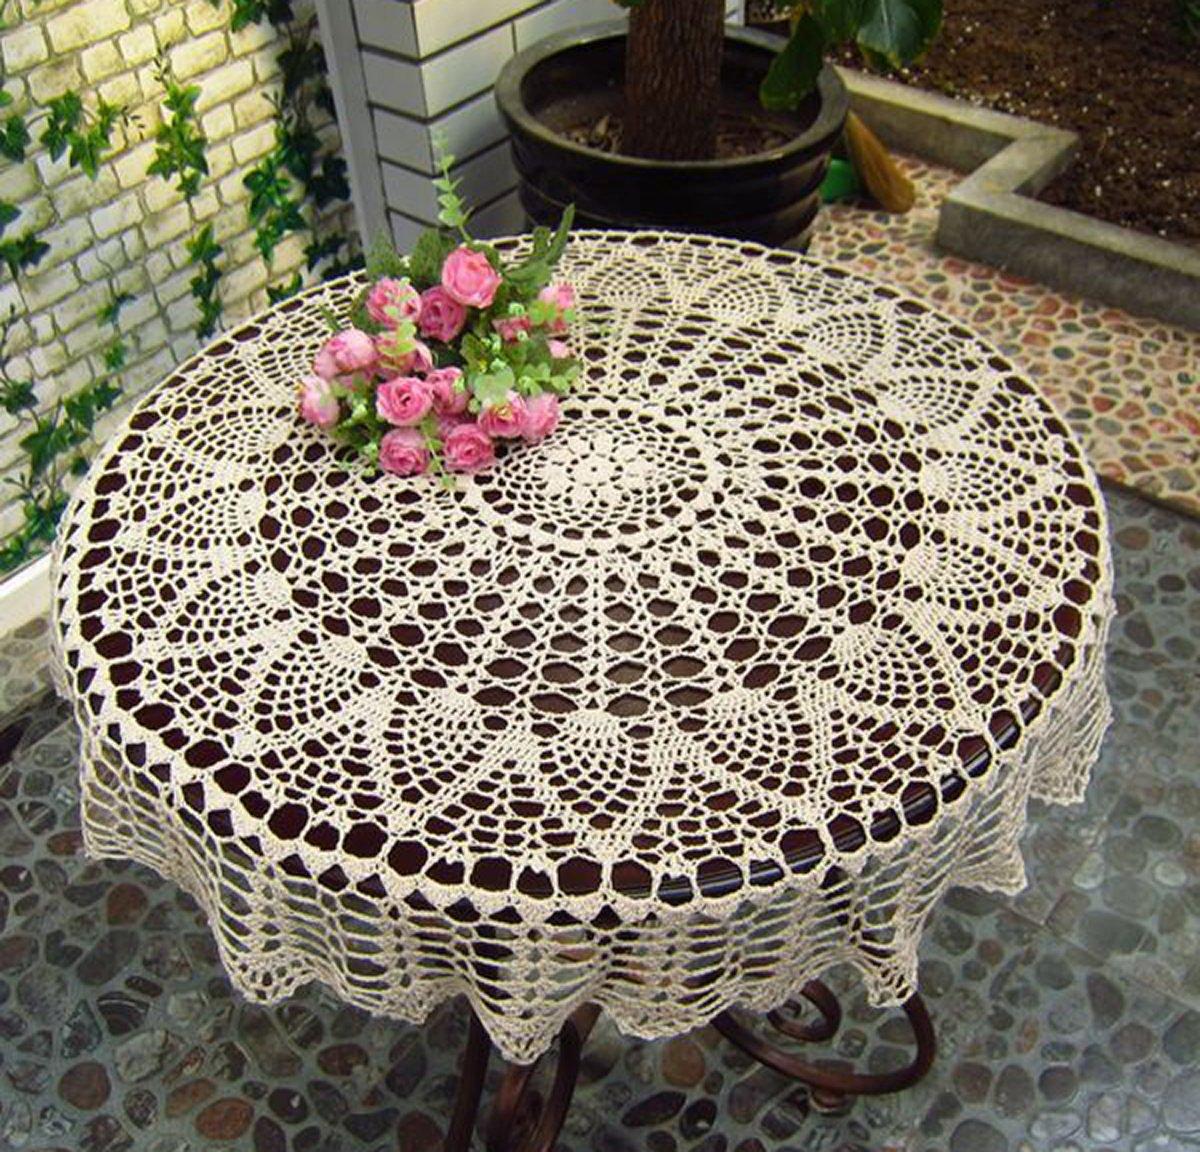 Handmade Round Crochet Sunflower Lace Tablecloth